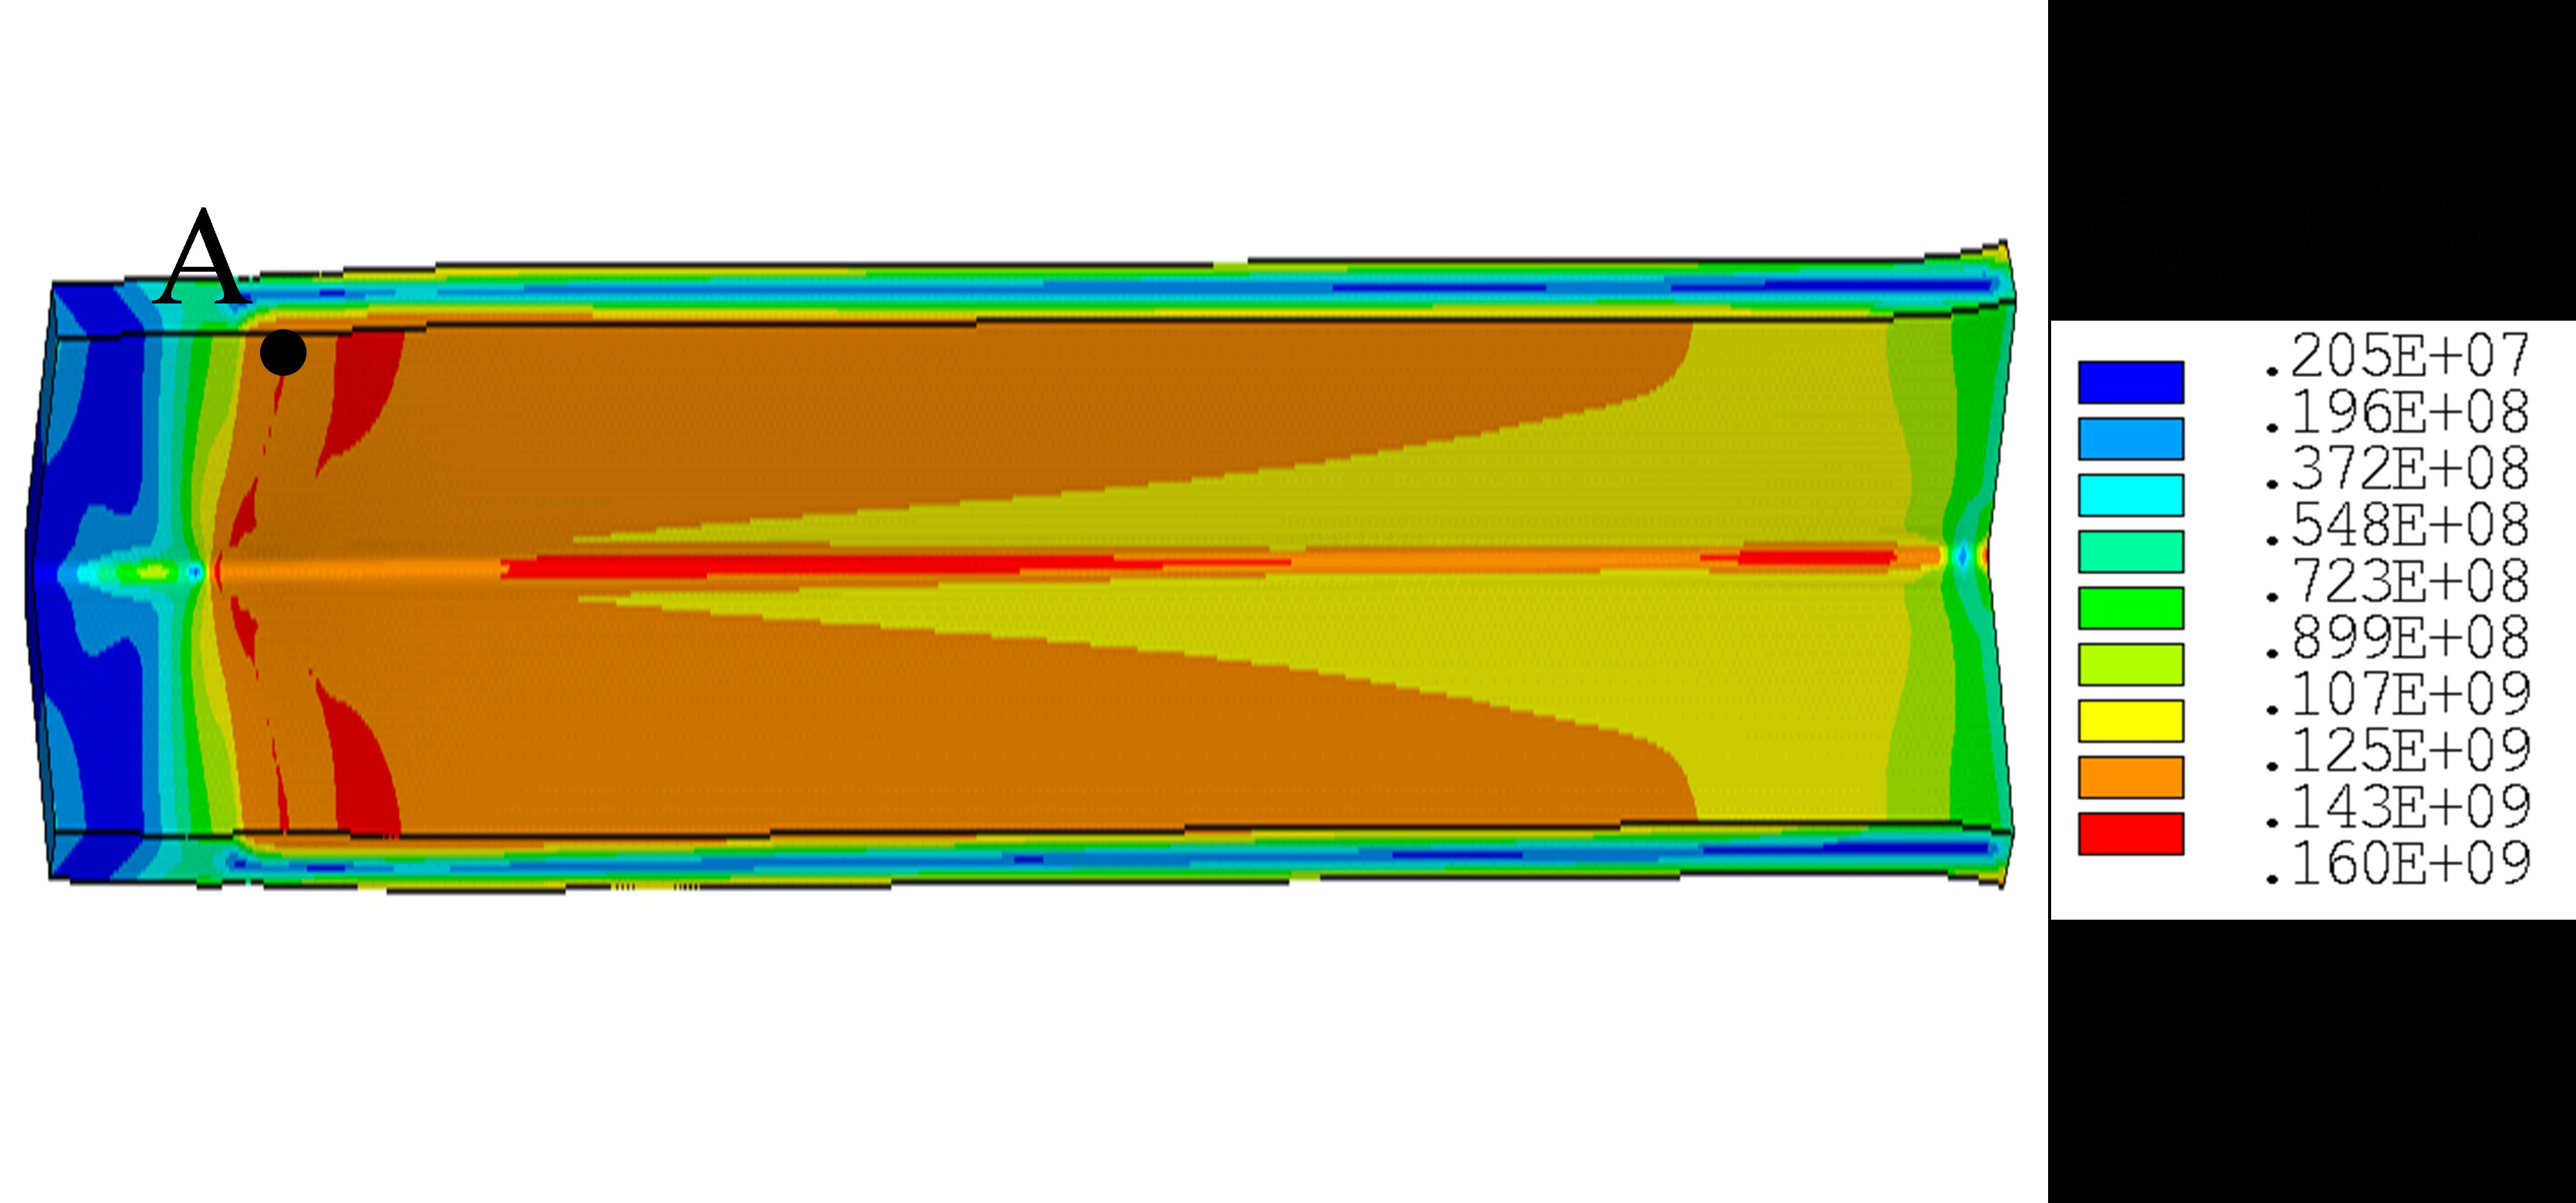 شکل ۶- توزیع استون فون میوز